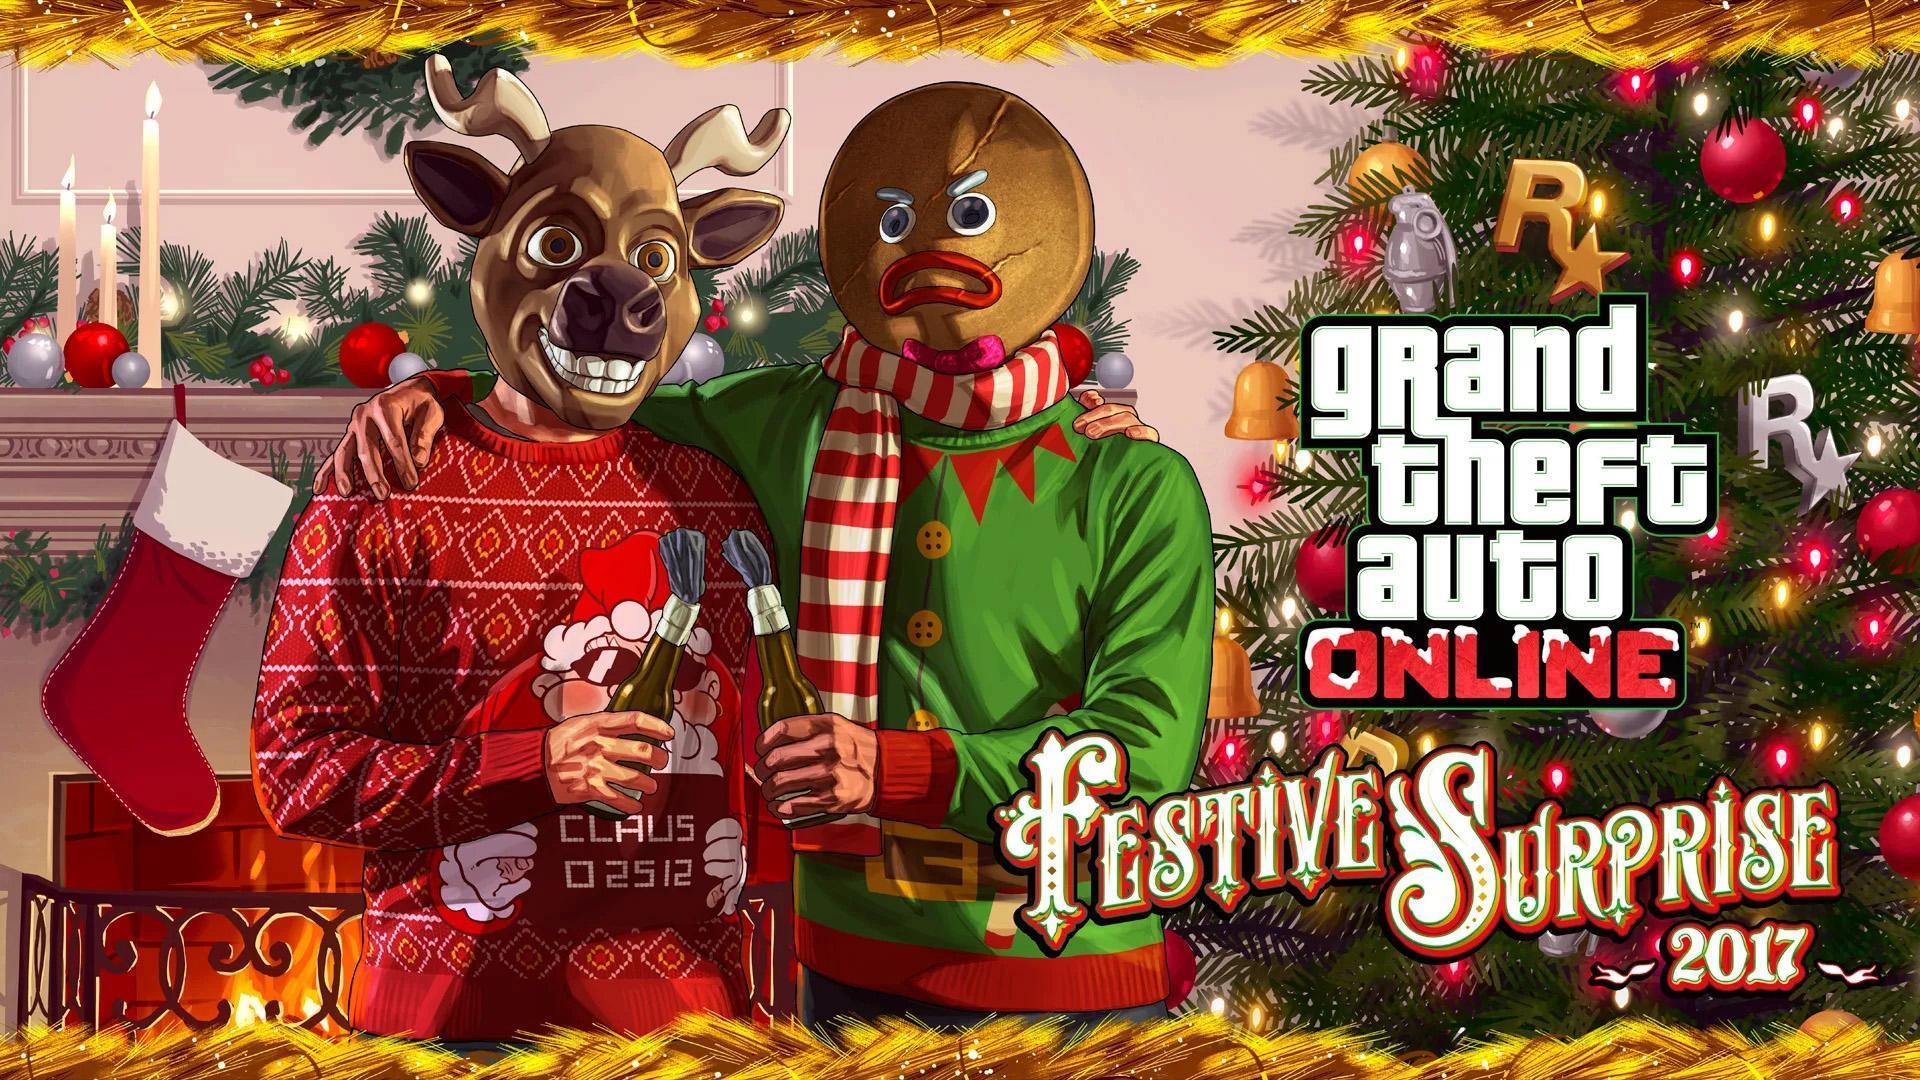 gta v artwork festivesurprise 2017 2 - Gta V Christmas